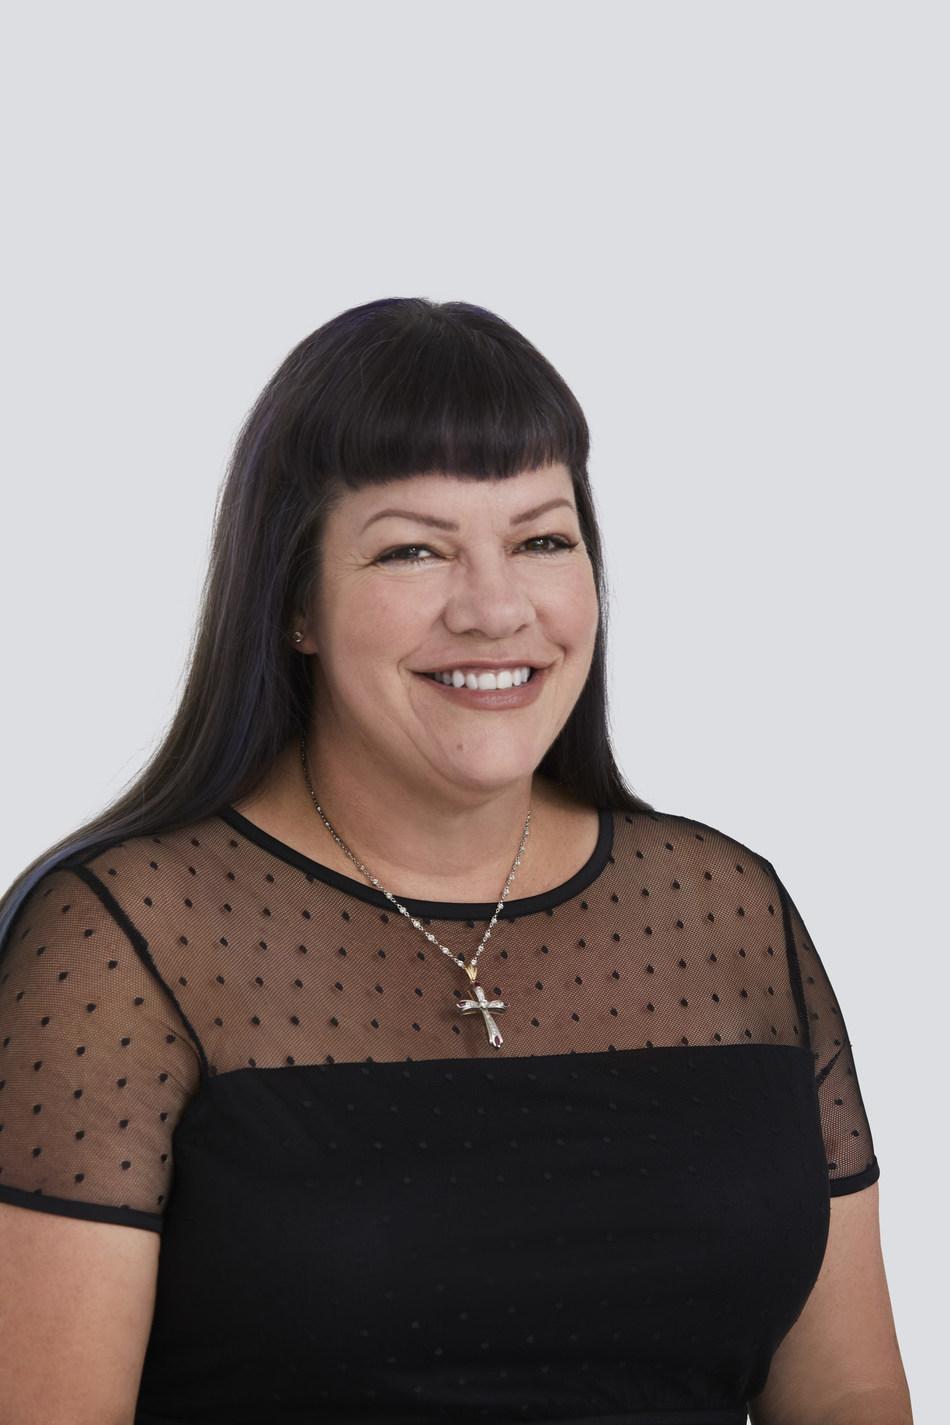 Torrid CEO Liz Muñoz